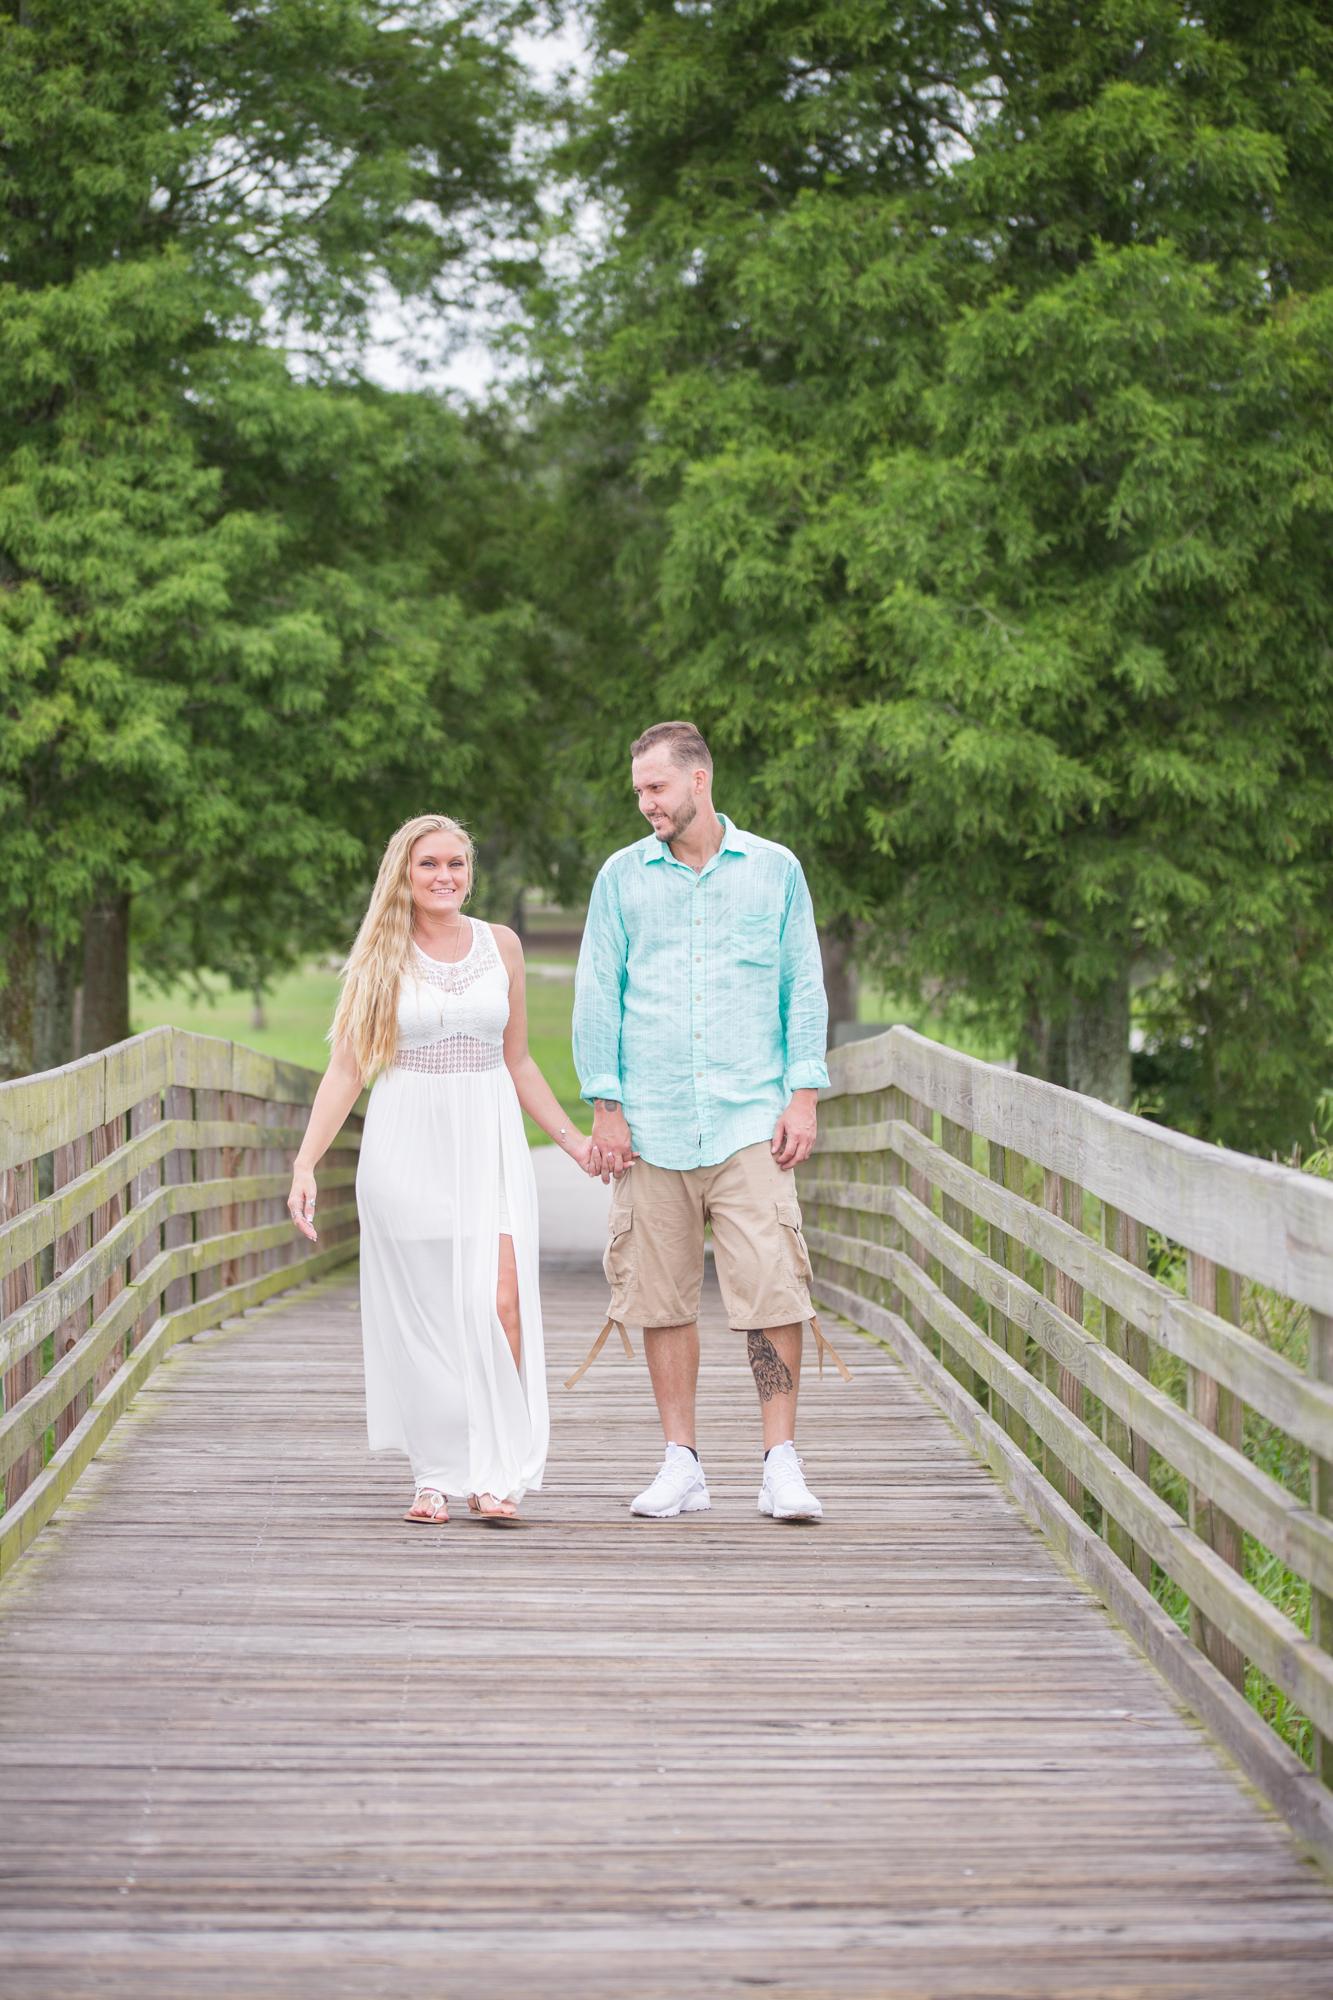 Medord Park_Plant City_Florida_Engagement_Session_Wedding_Photographer